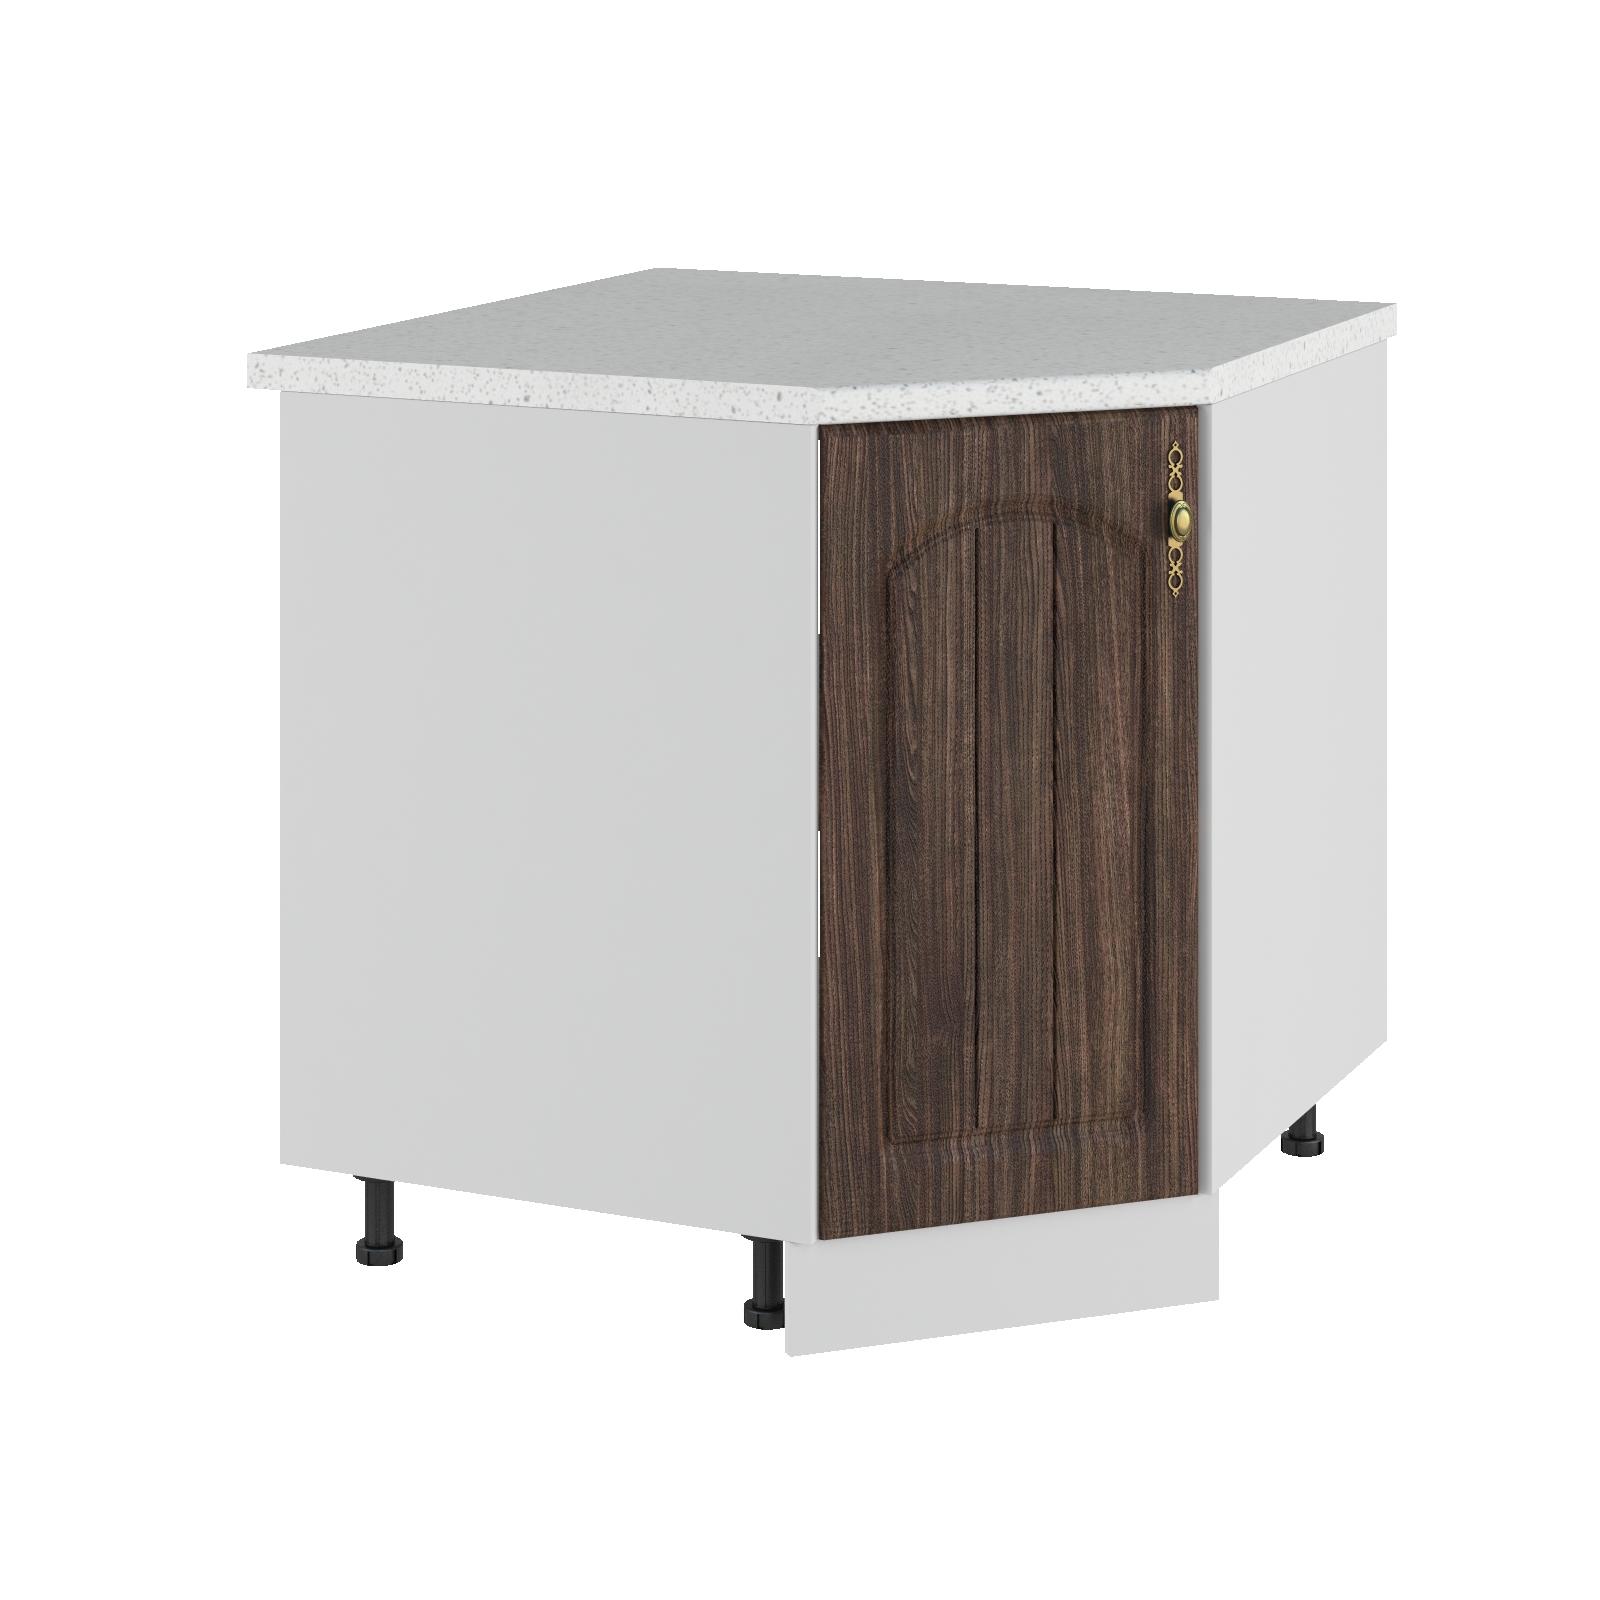 Кухня Монако СУ 850*850 Шкаф нижний угловой левый